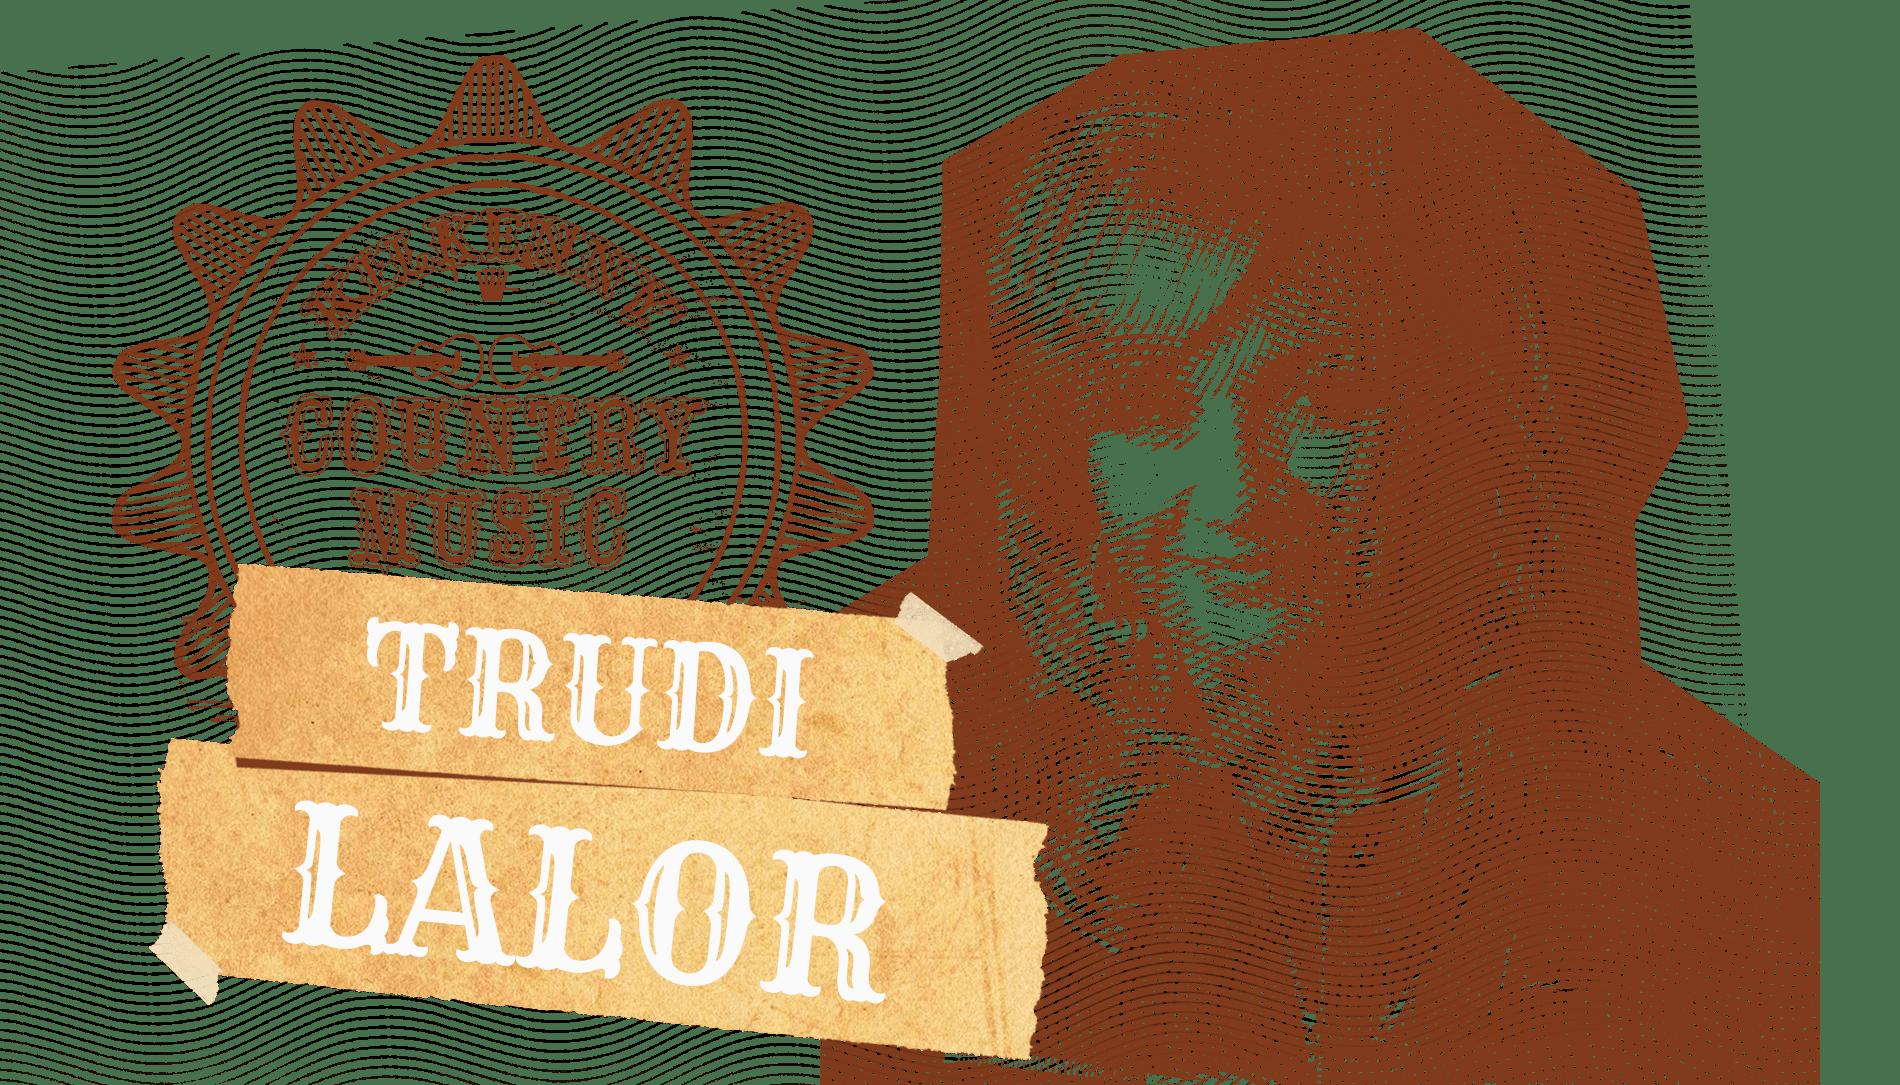 Trudi-1